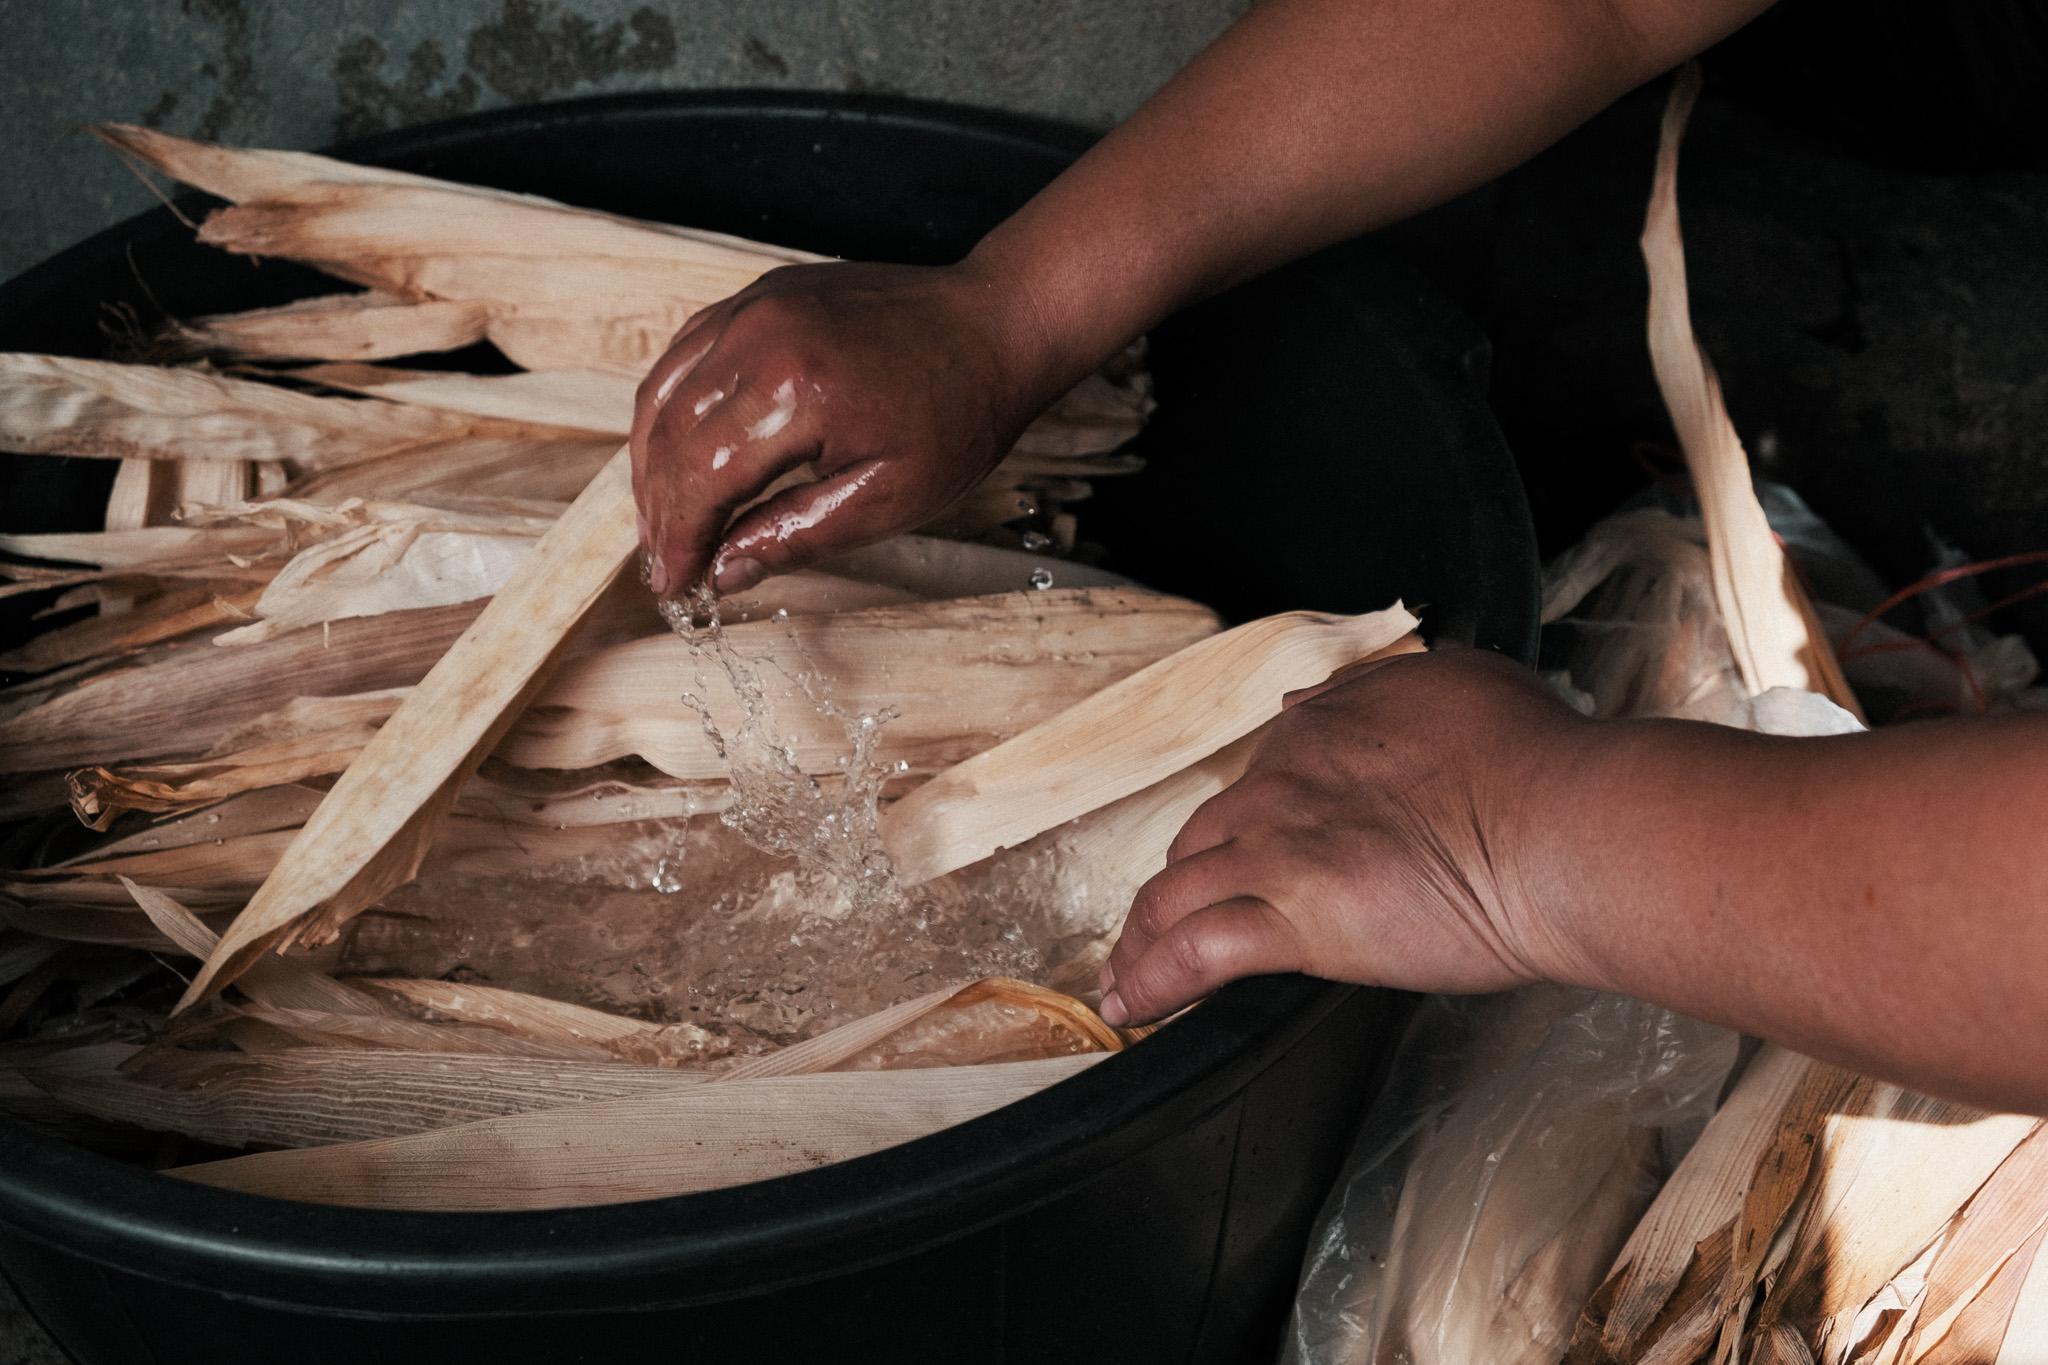 Washing the corn husks for the chuchitos.